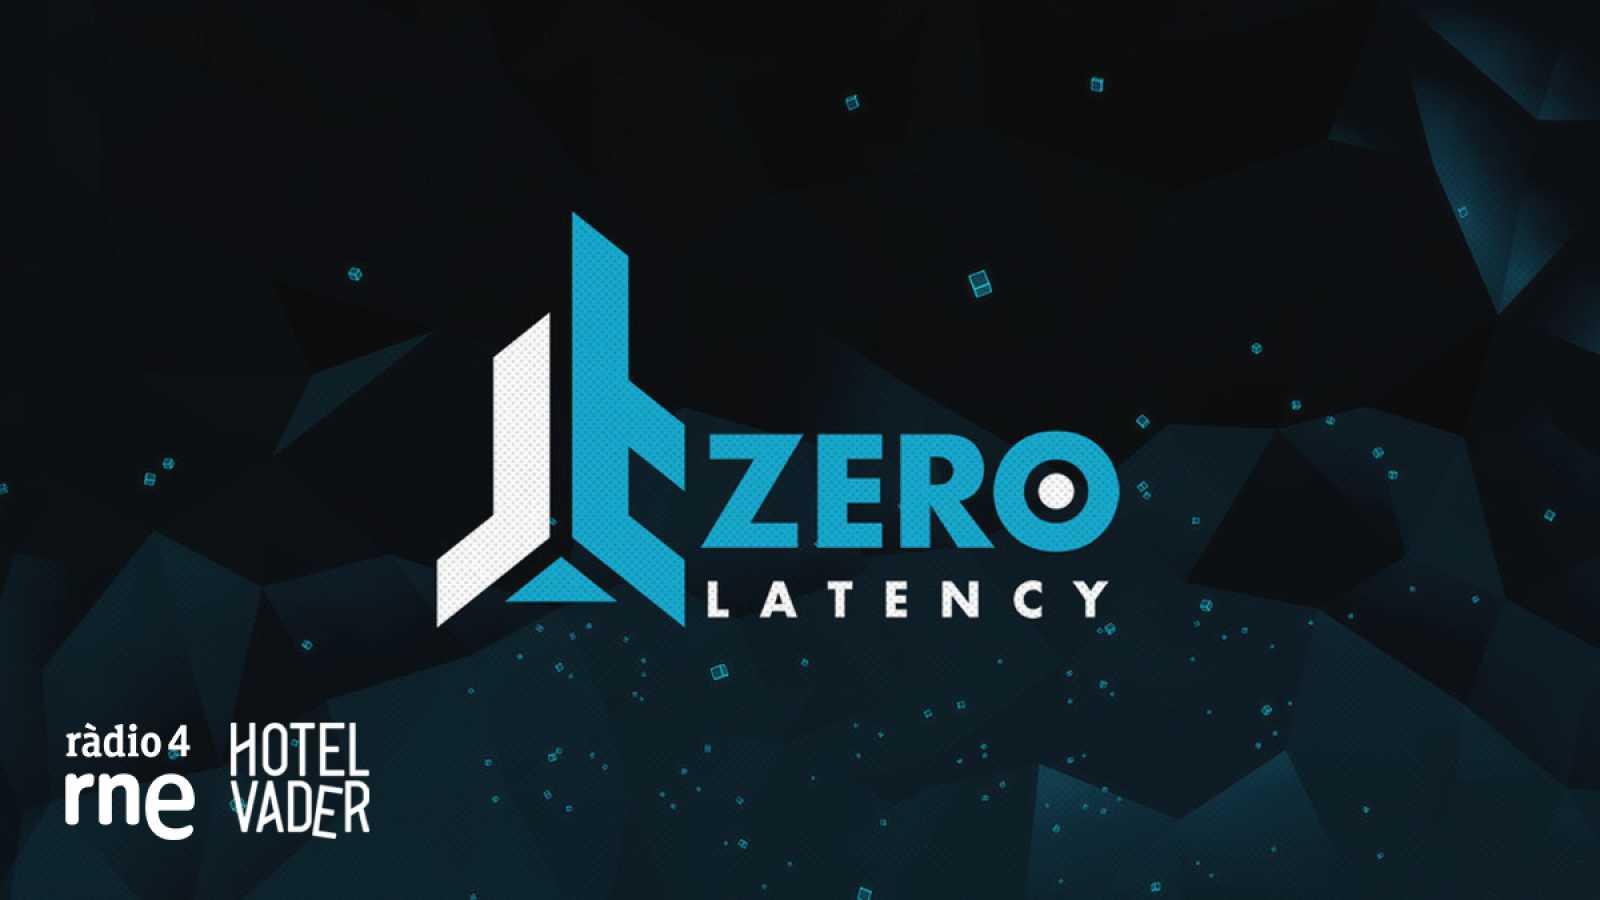 Hotel Vader - 'Zero Latency'